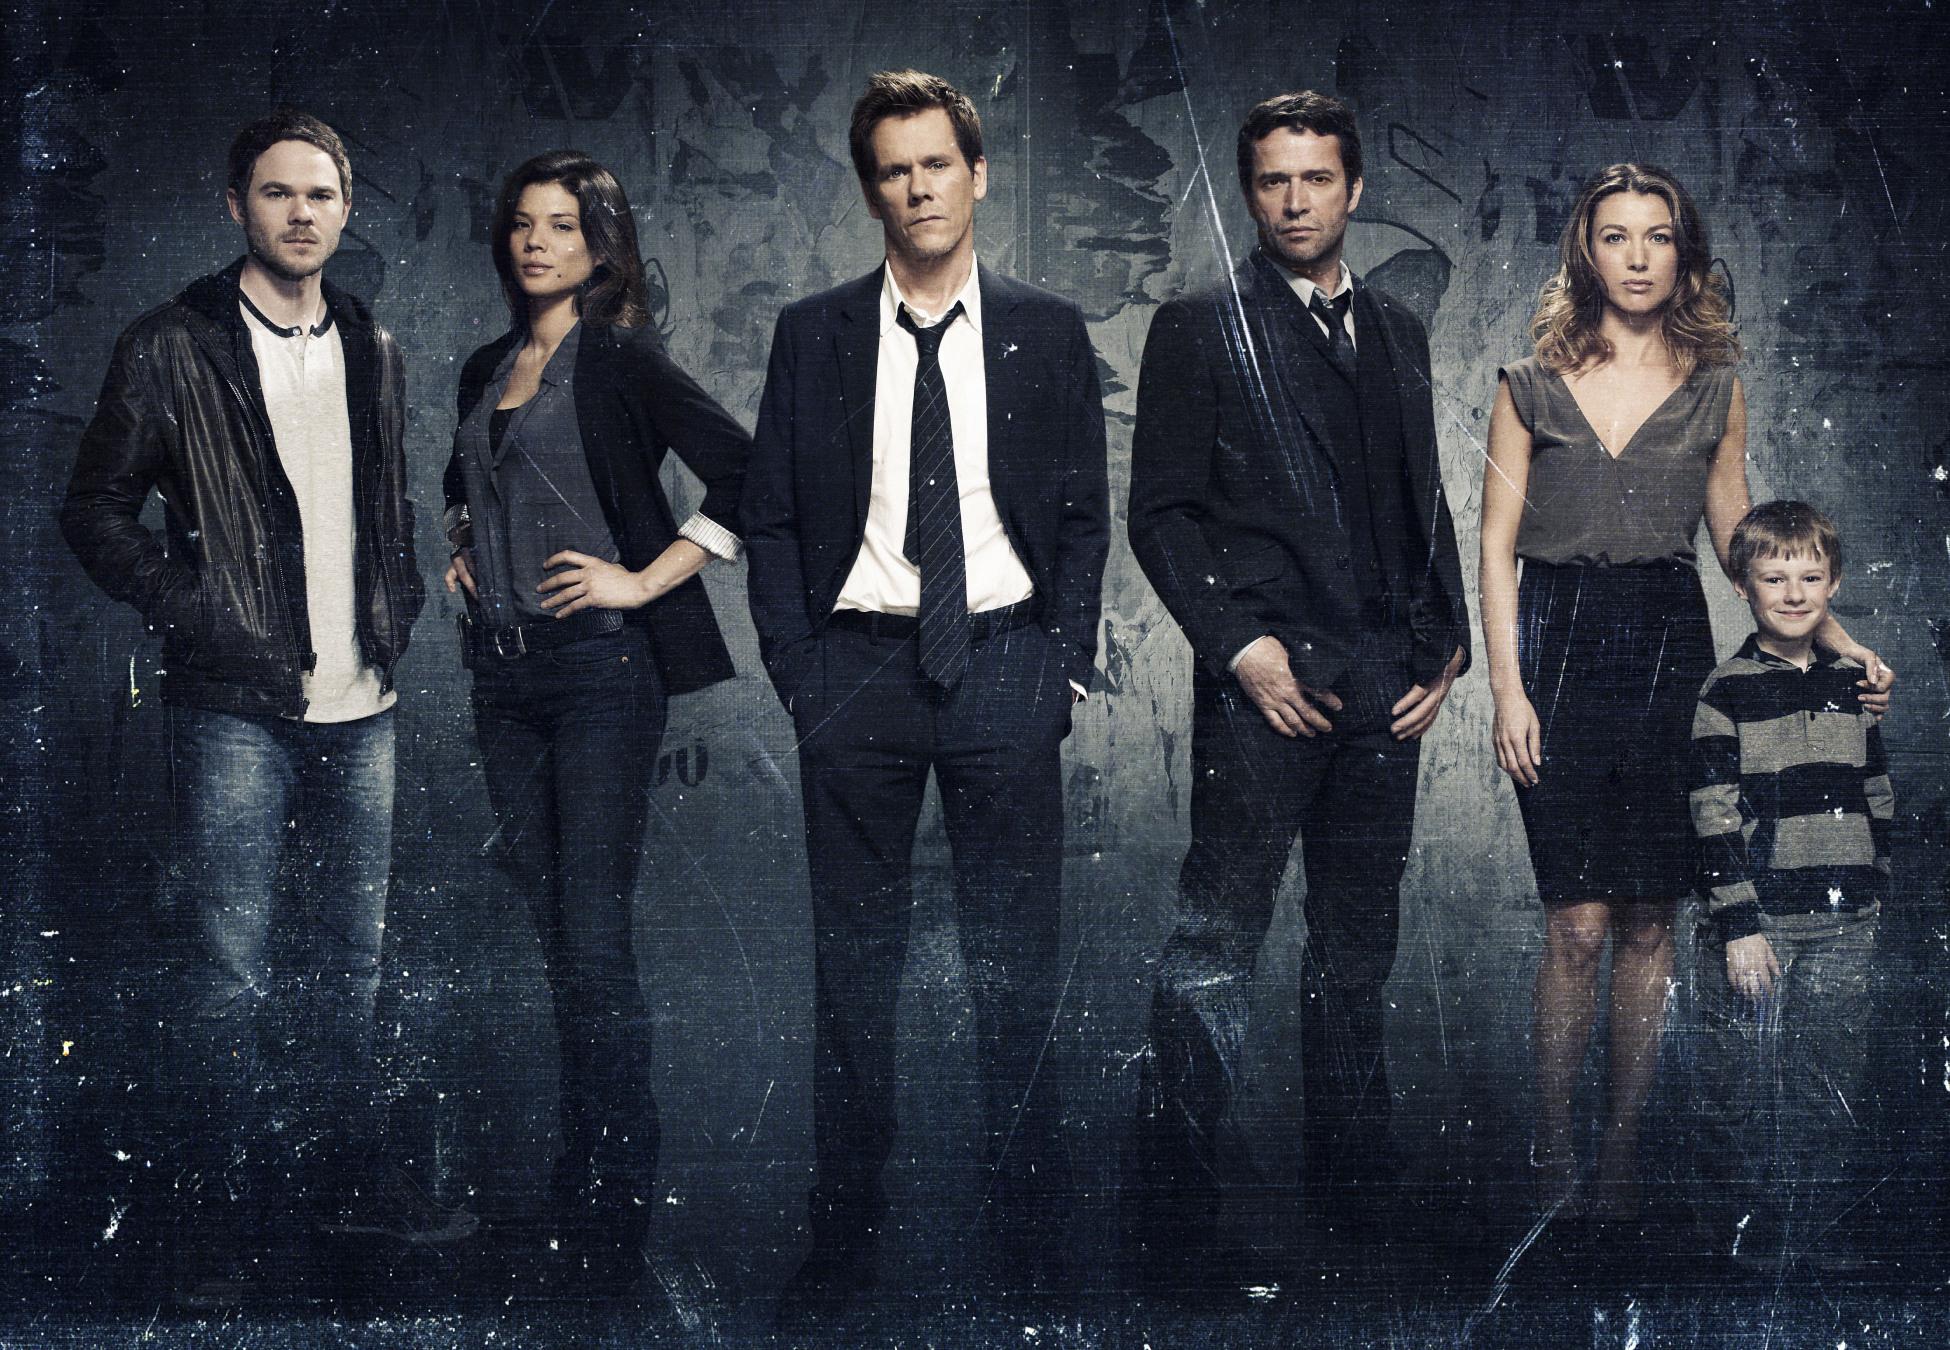 Midseason 2012/2013 New TV Shows – The Following – 0n FOX